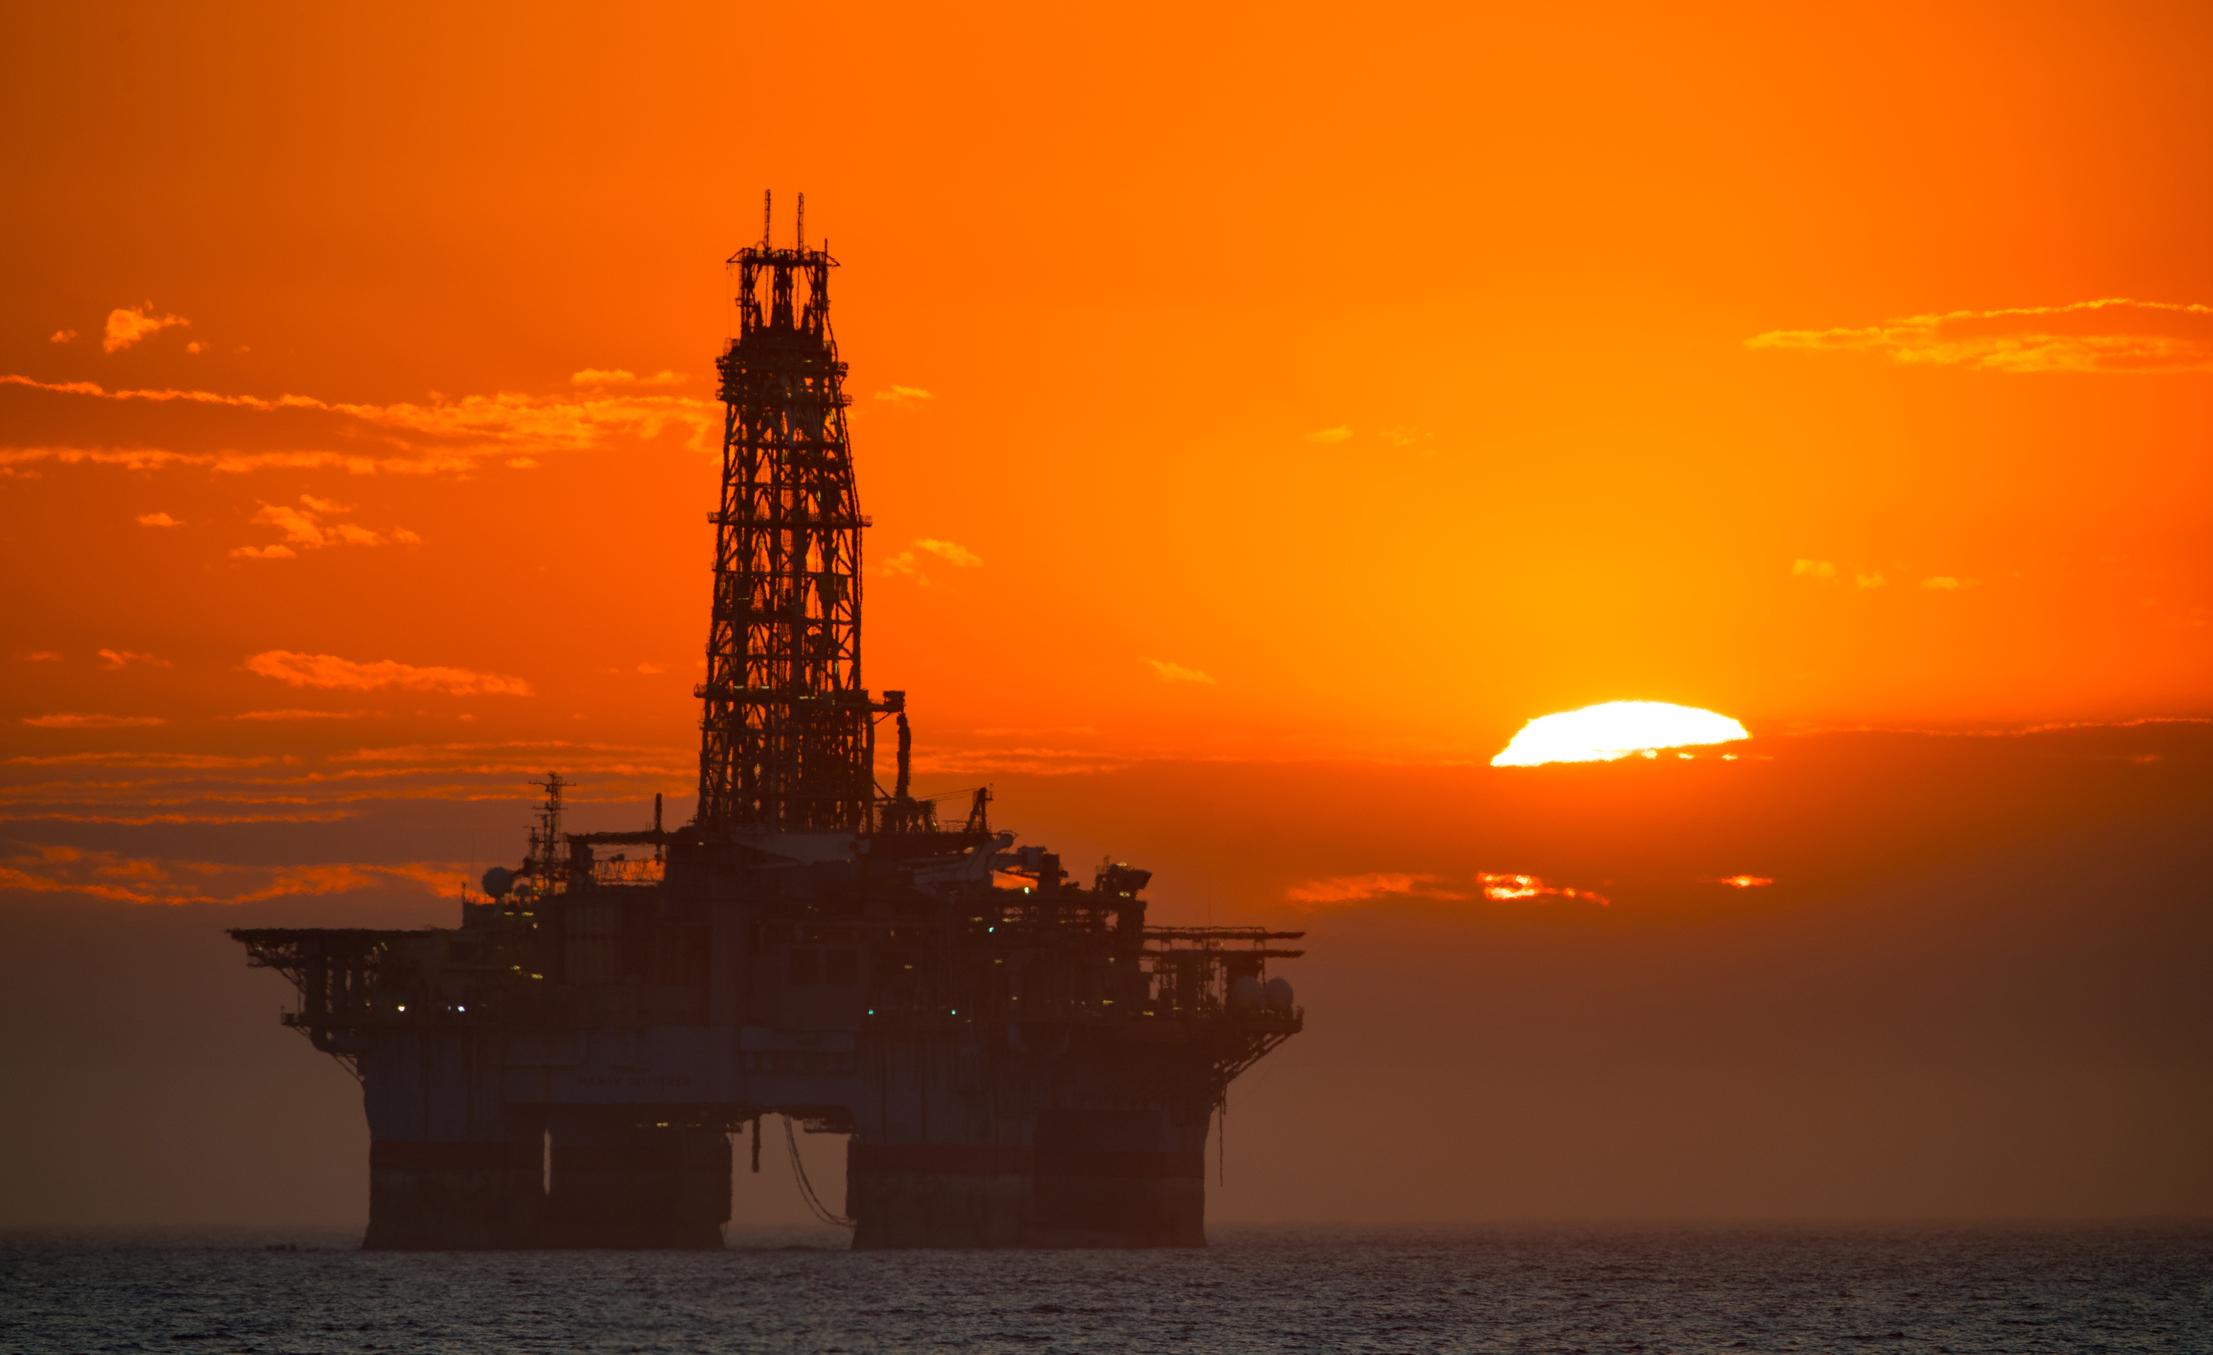 oil platform 3.jpg